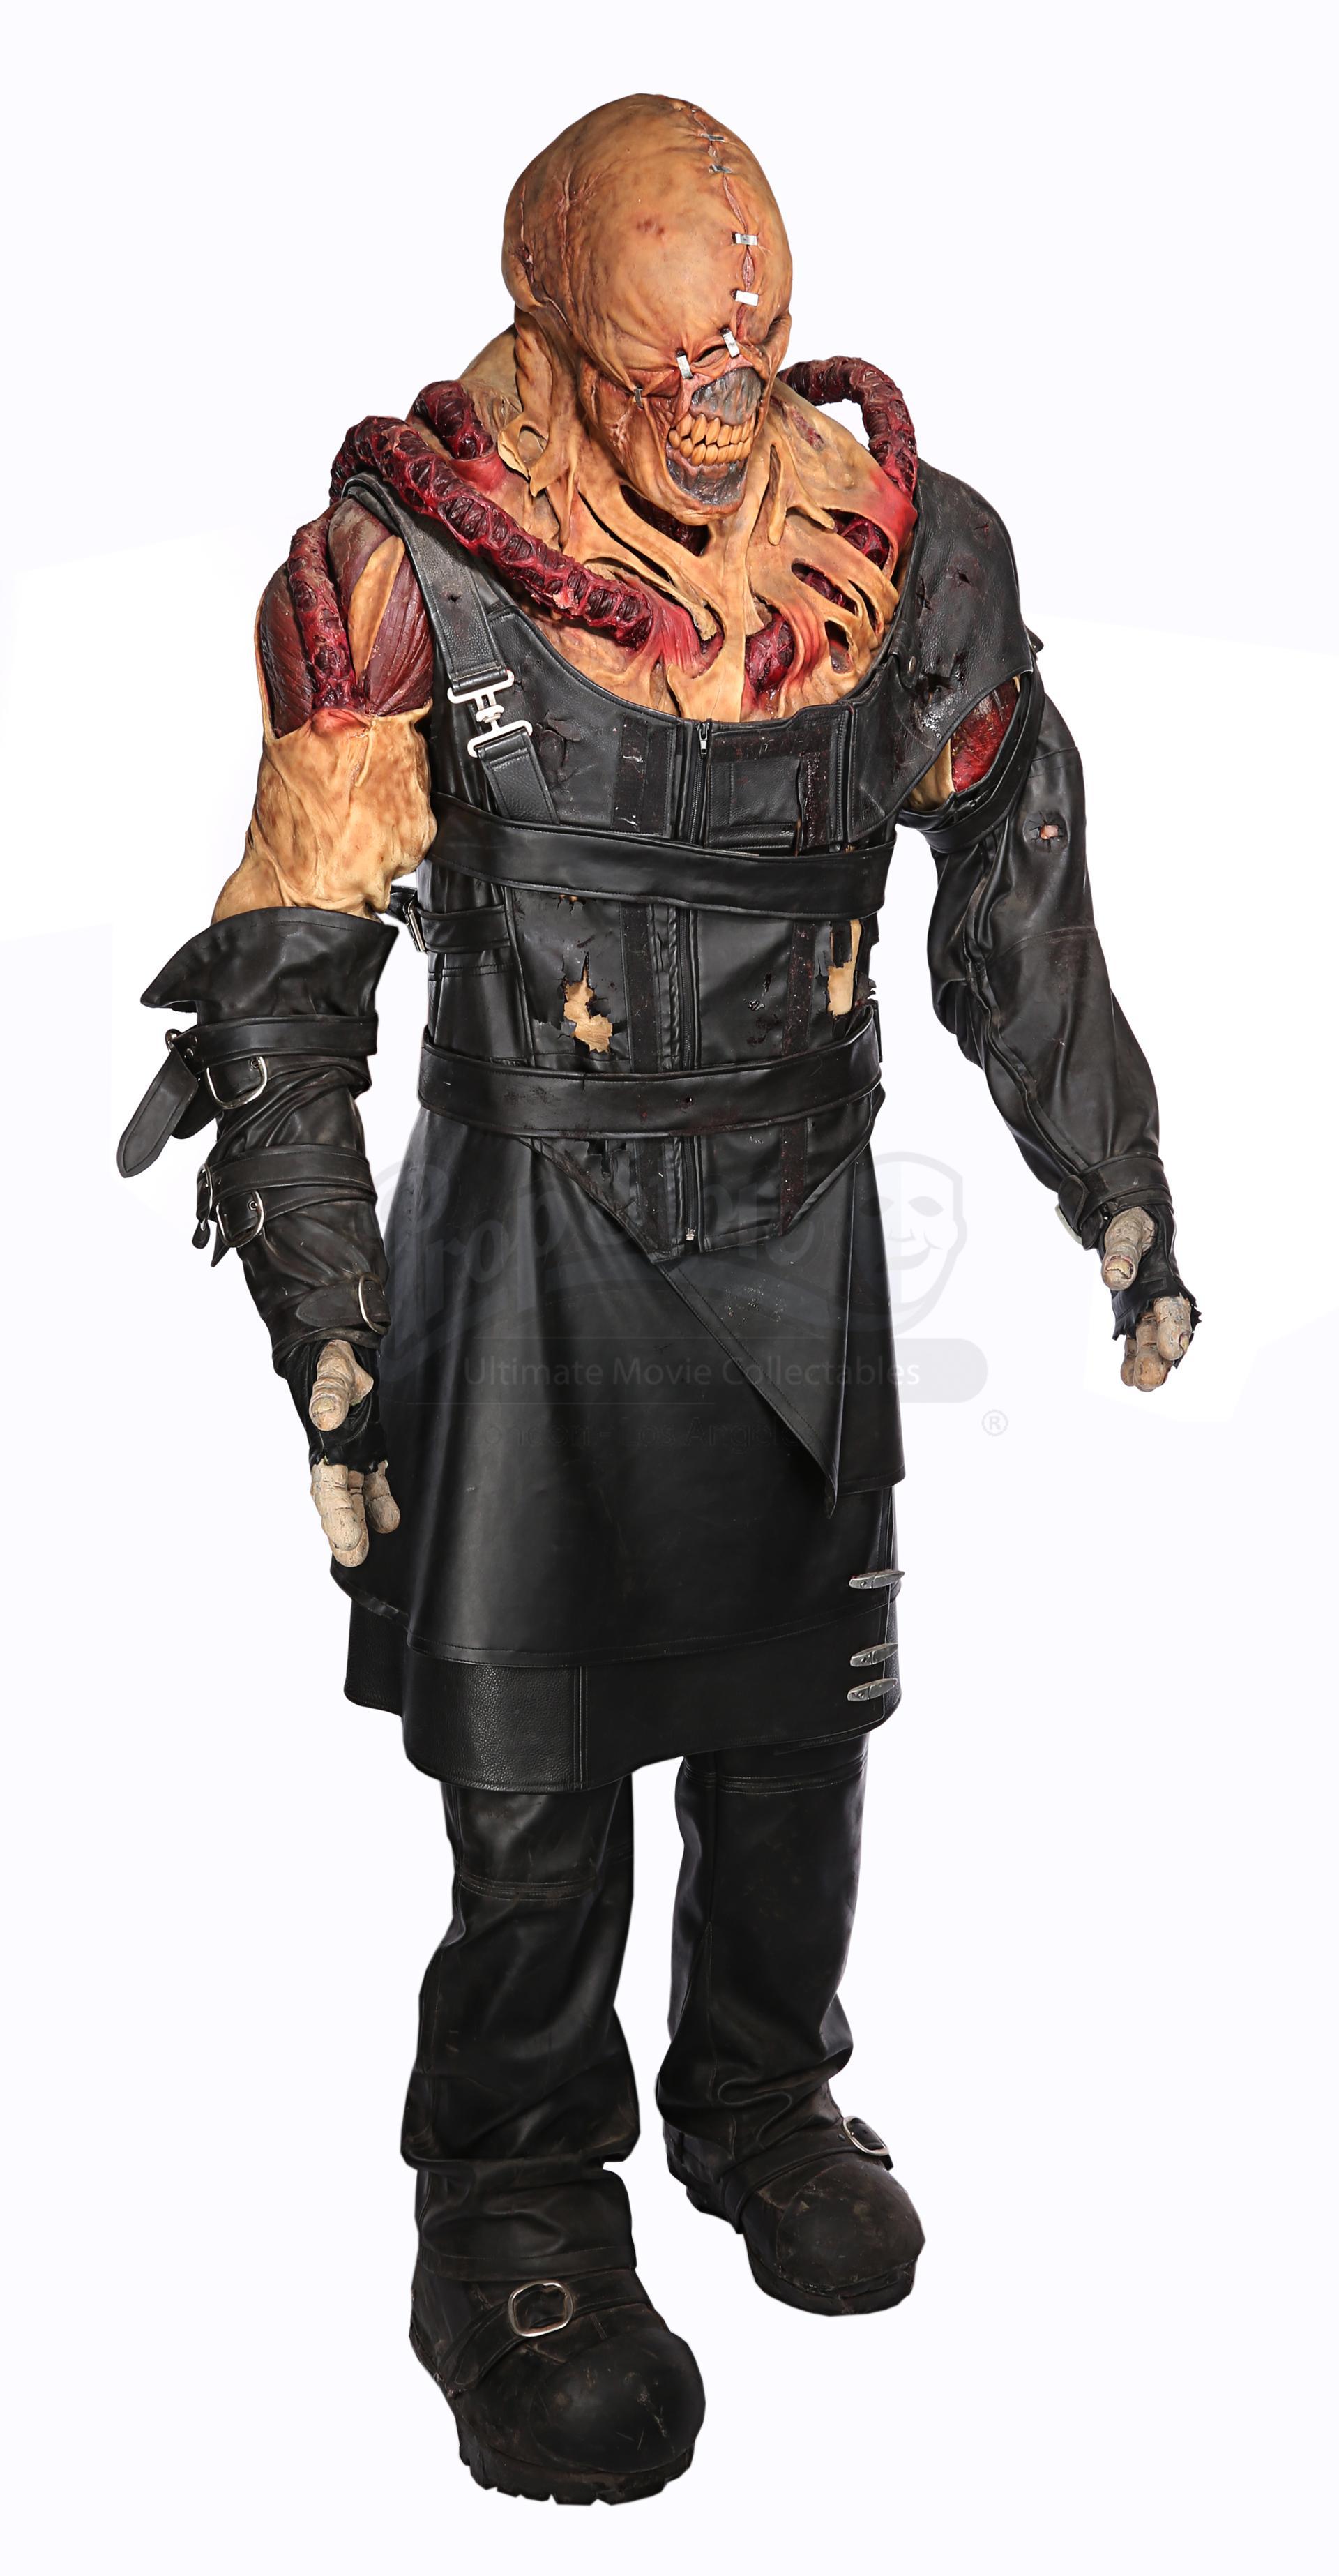 Lot 592 Resident Evil Apocalypse 2004 The Nemesis Matthew G Taylor Costume And Prosthetics Price Estimate 8000 12000